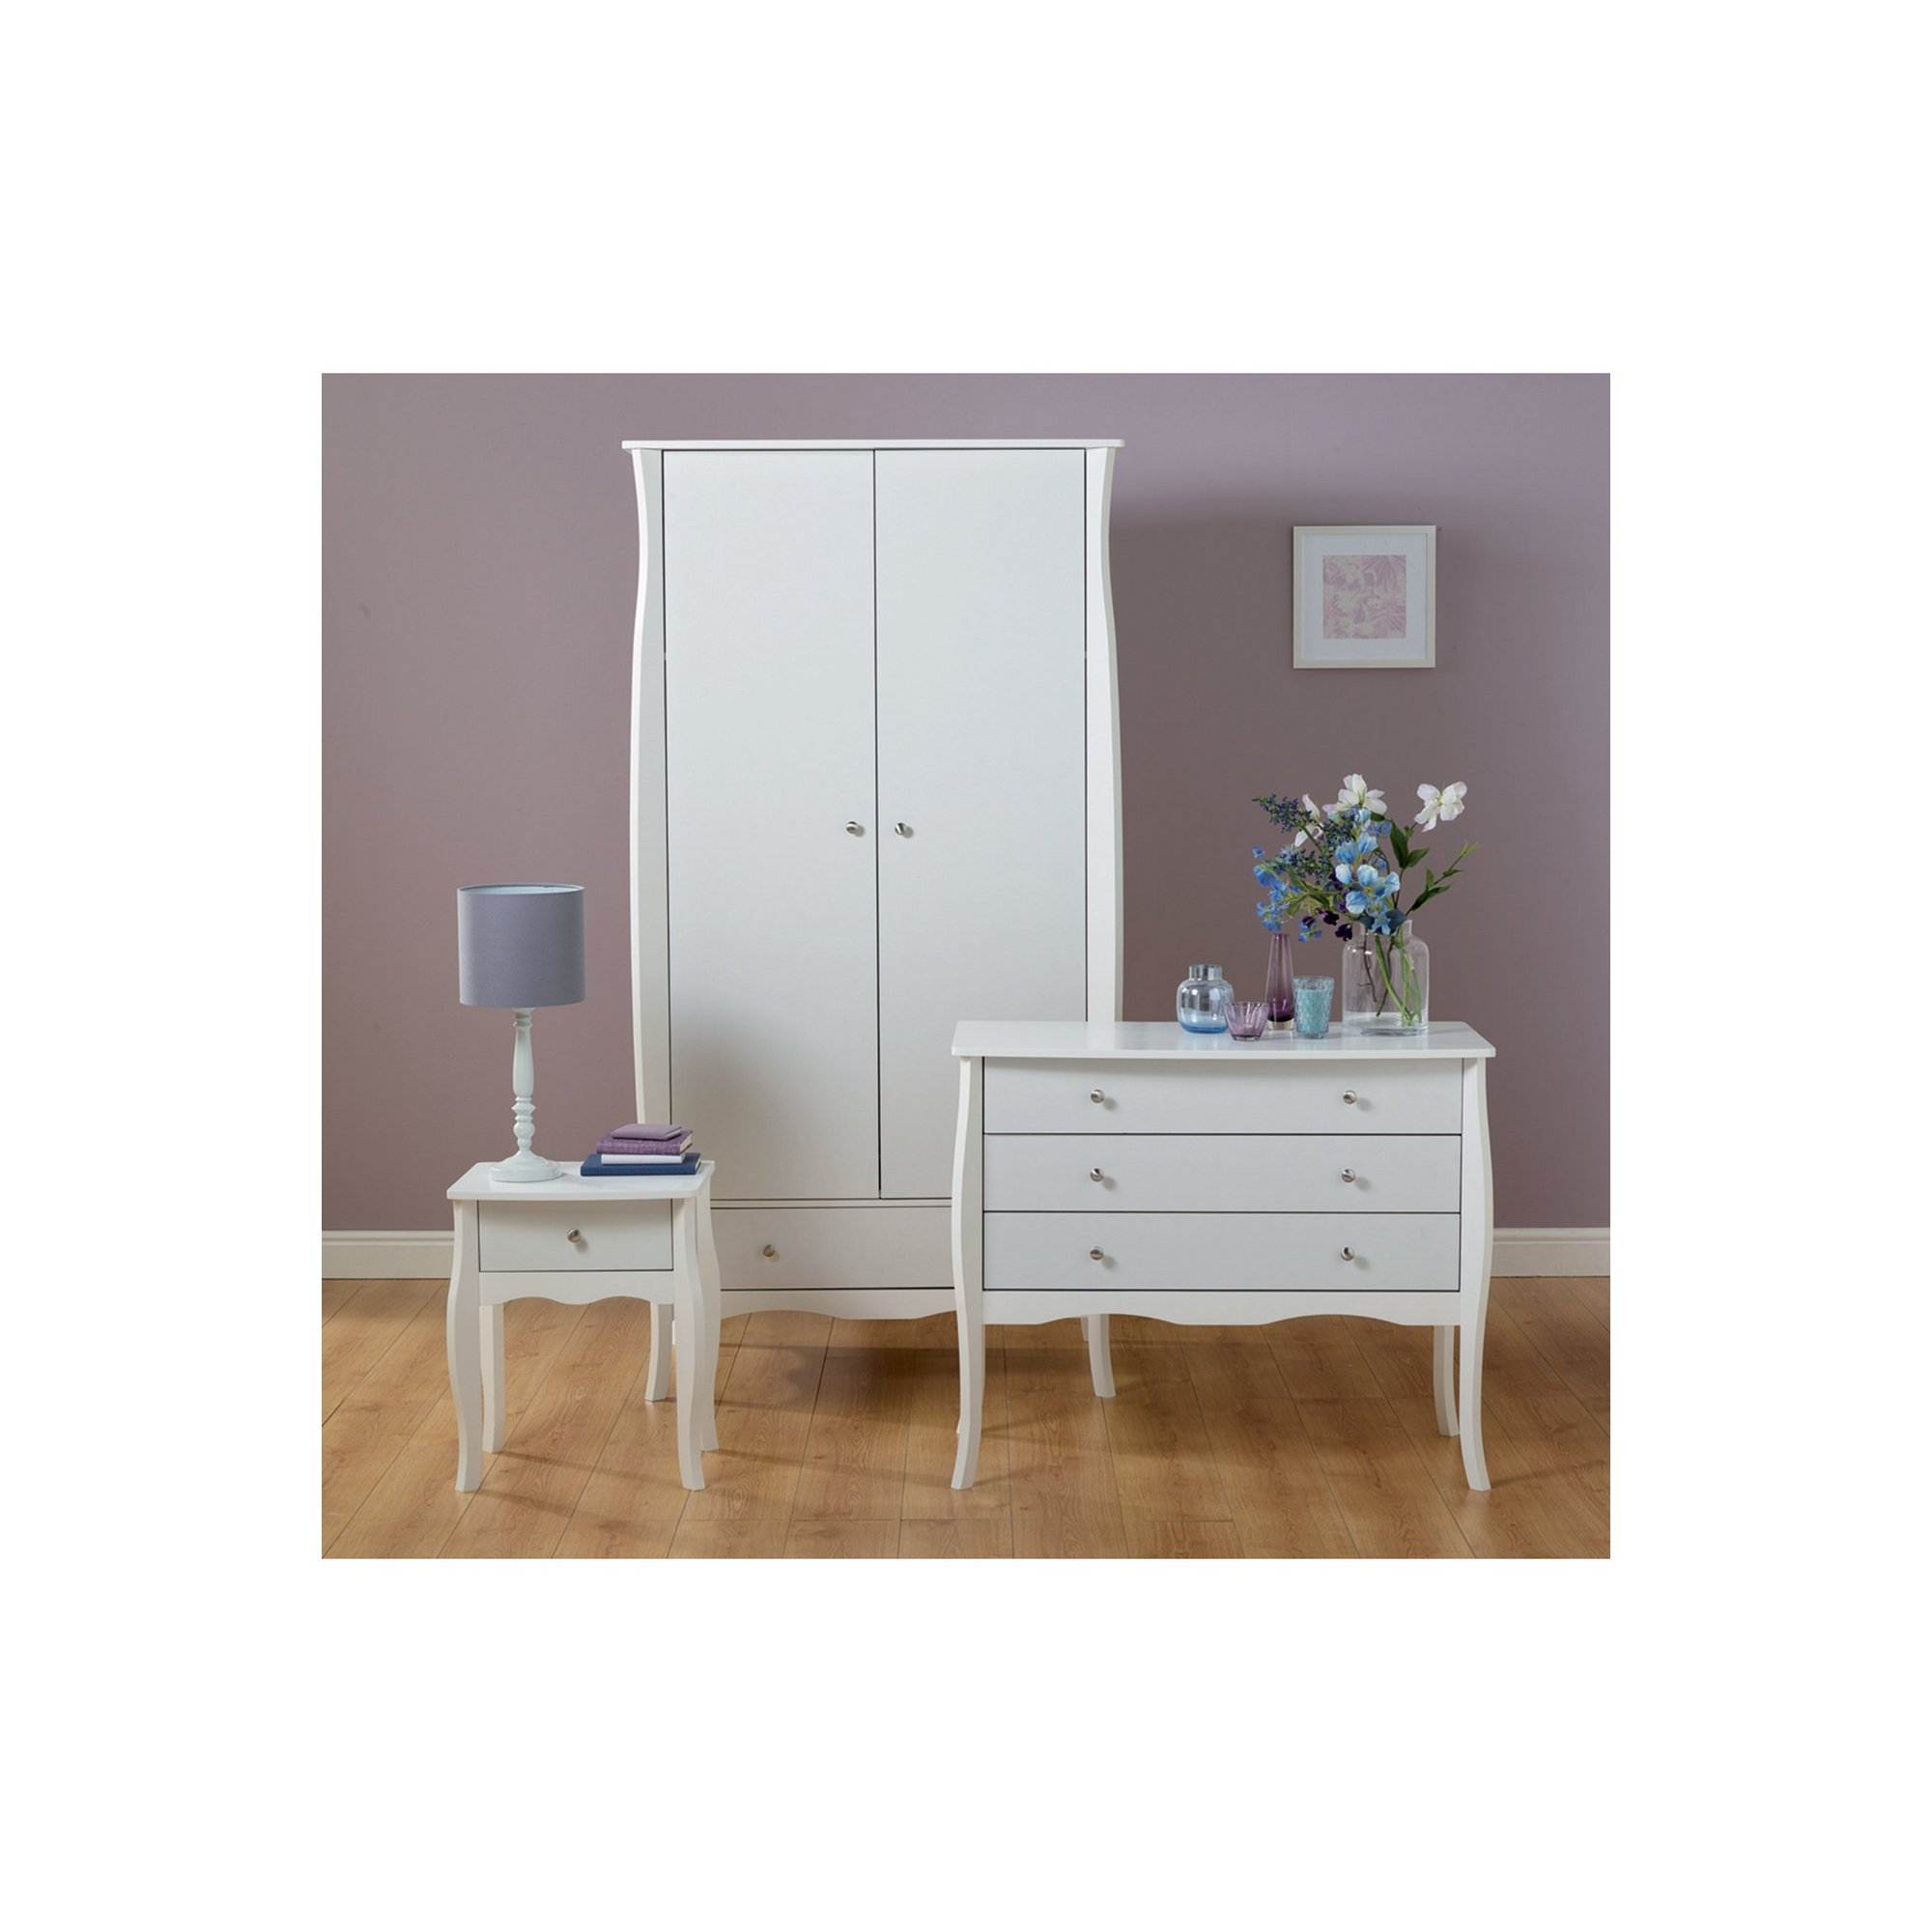 Image of Amelie 3-Piece Bedroom Set